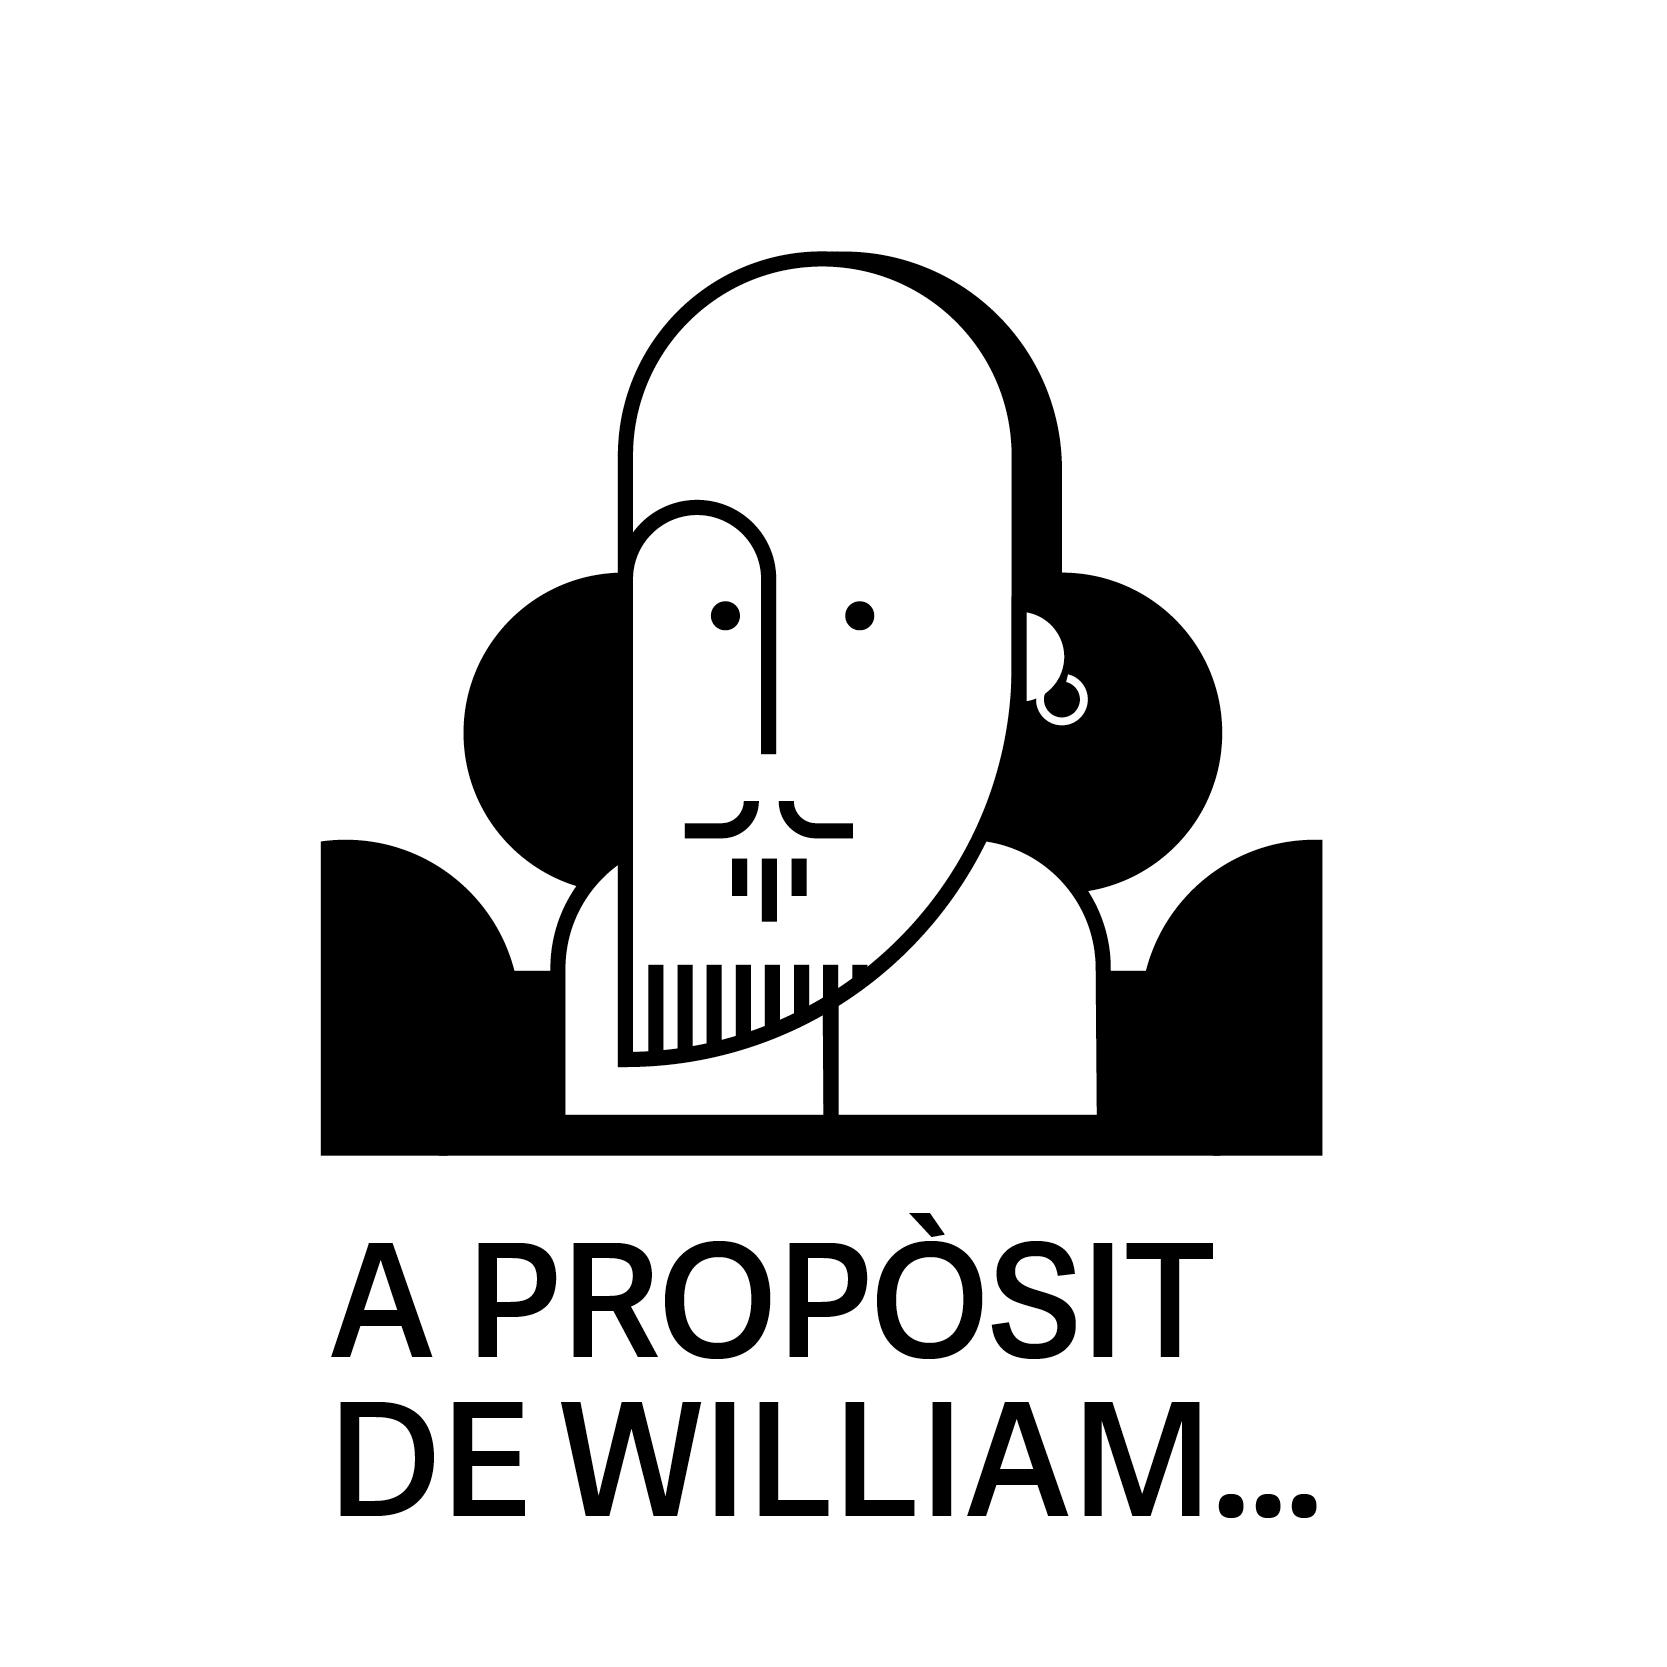 A proposit de William